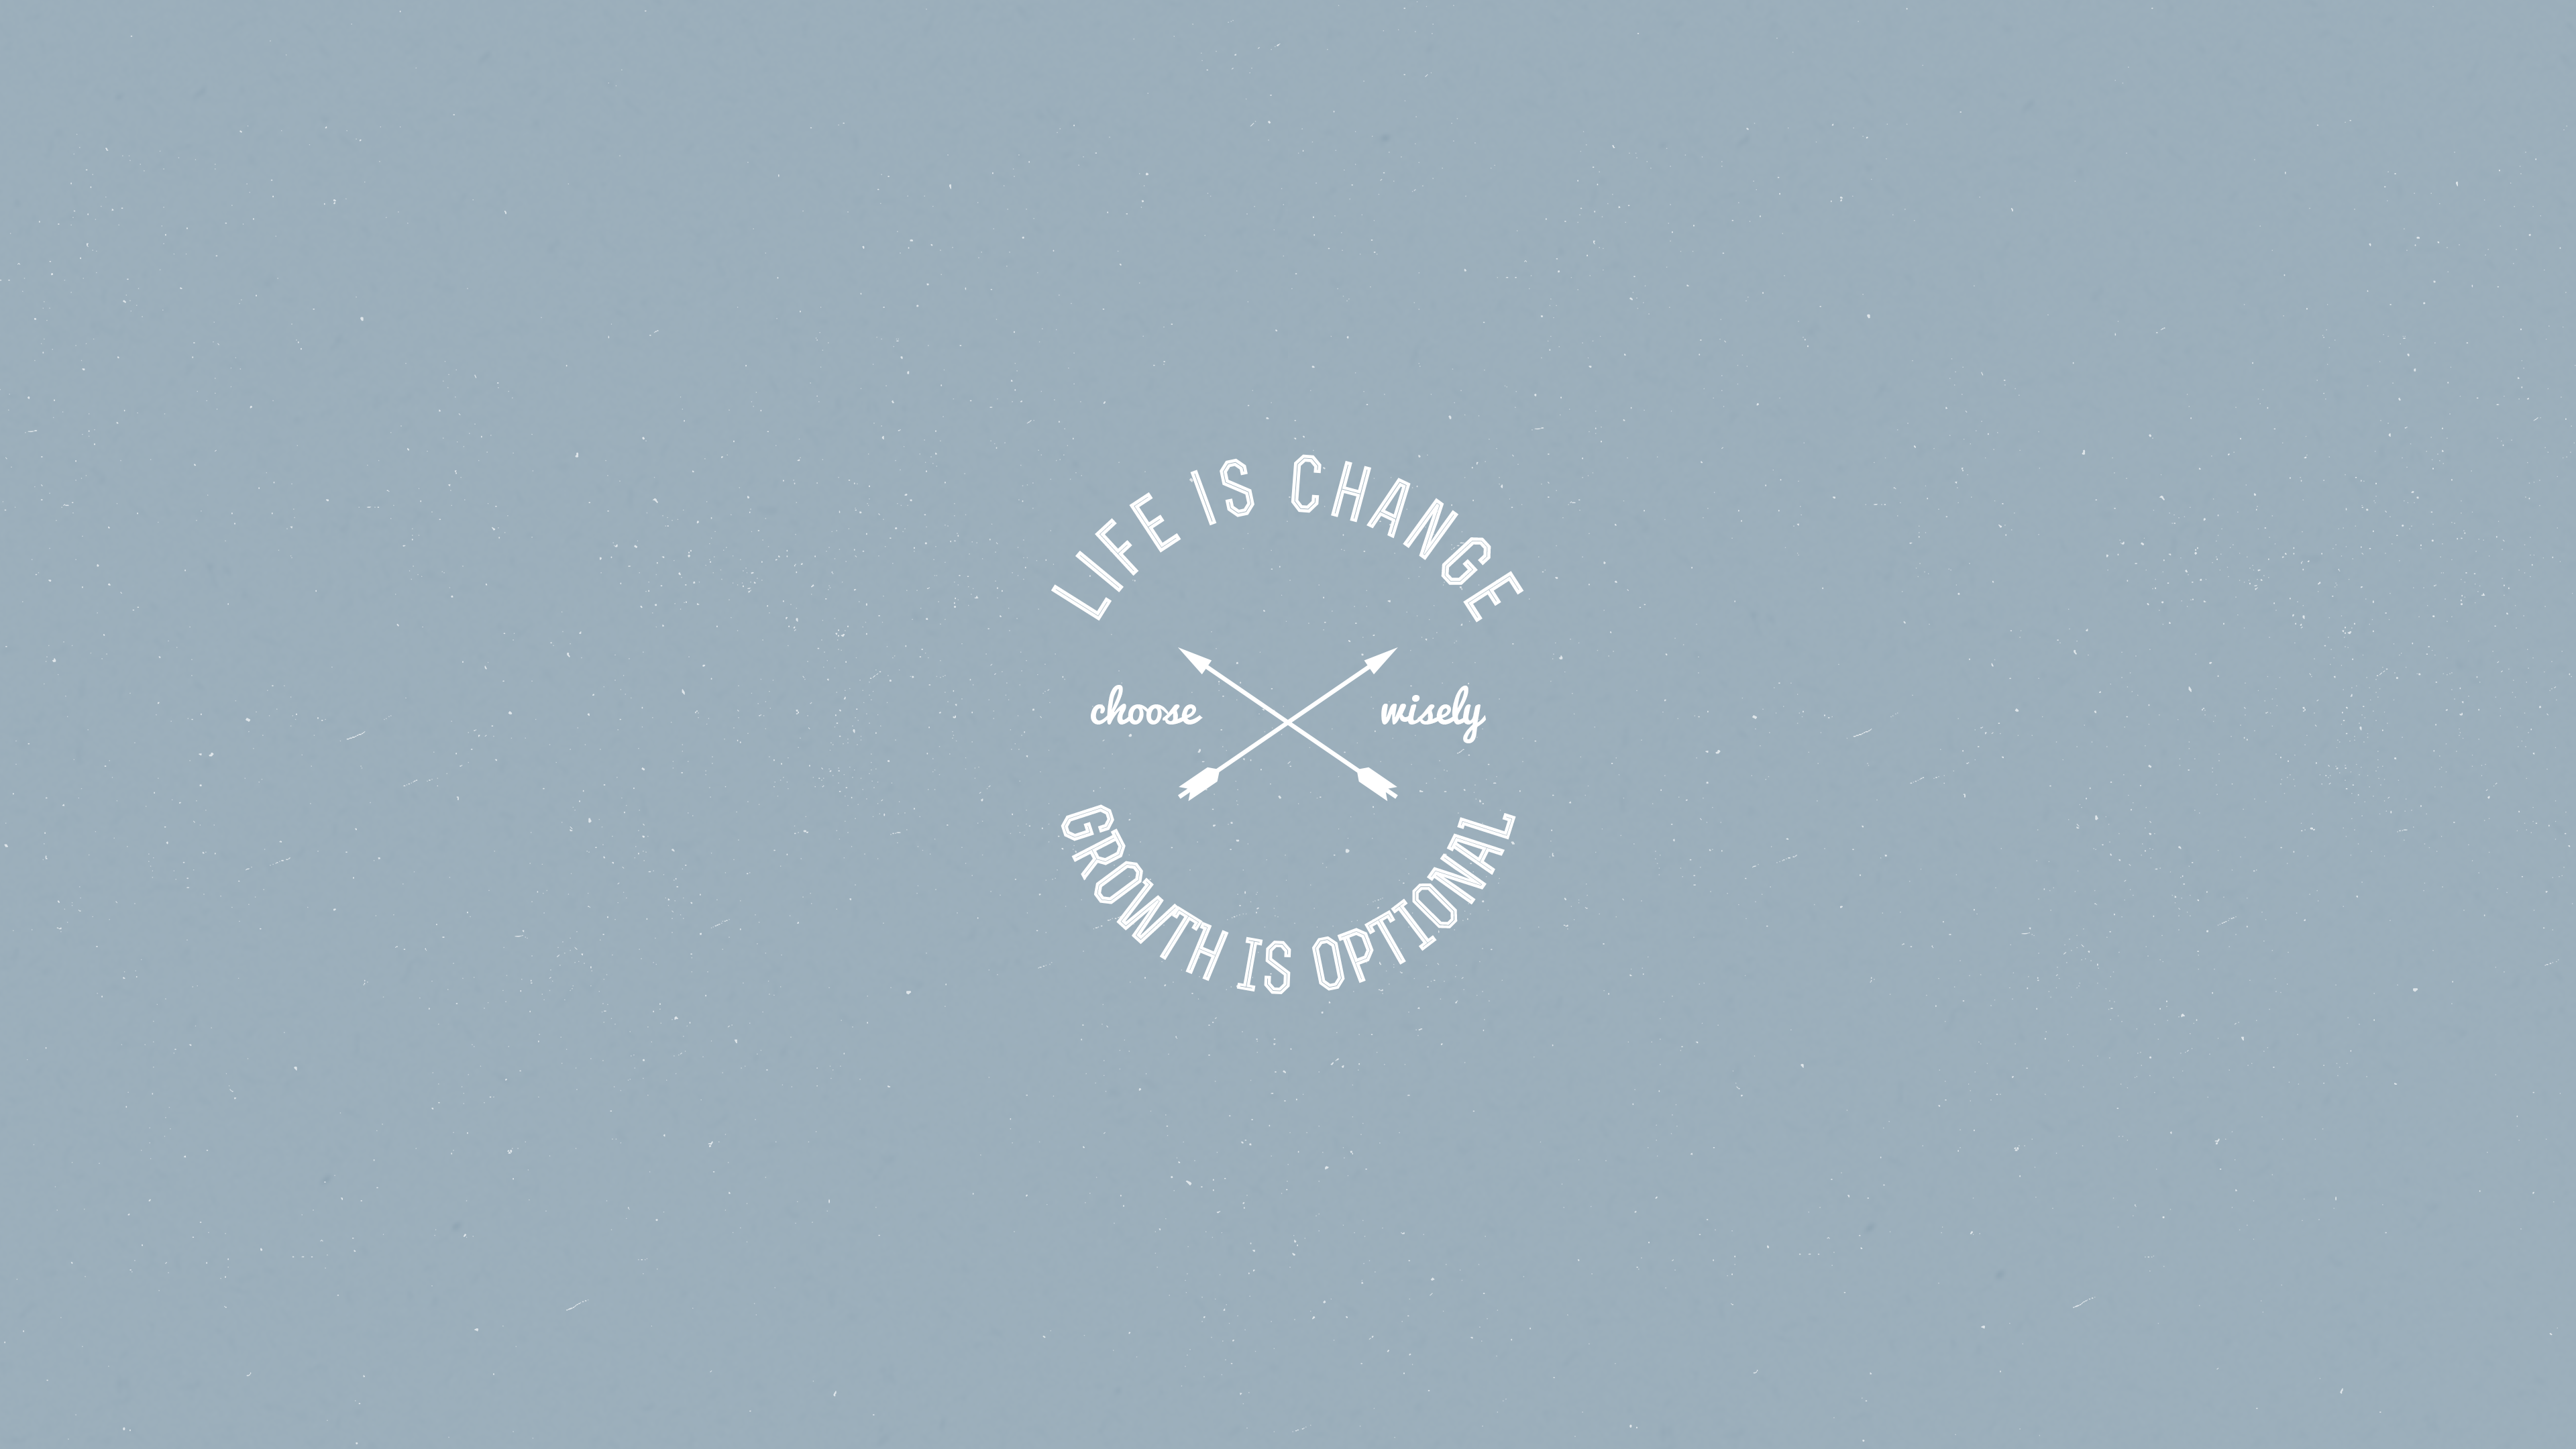 Life is change. Growth is optional.